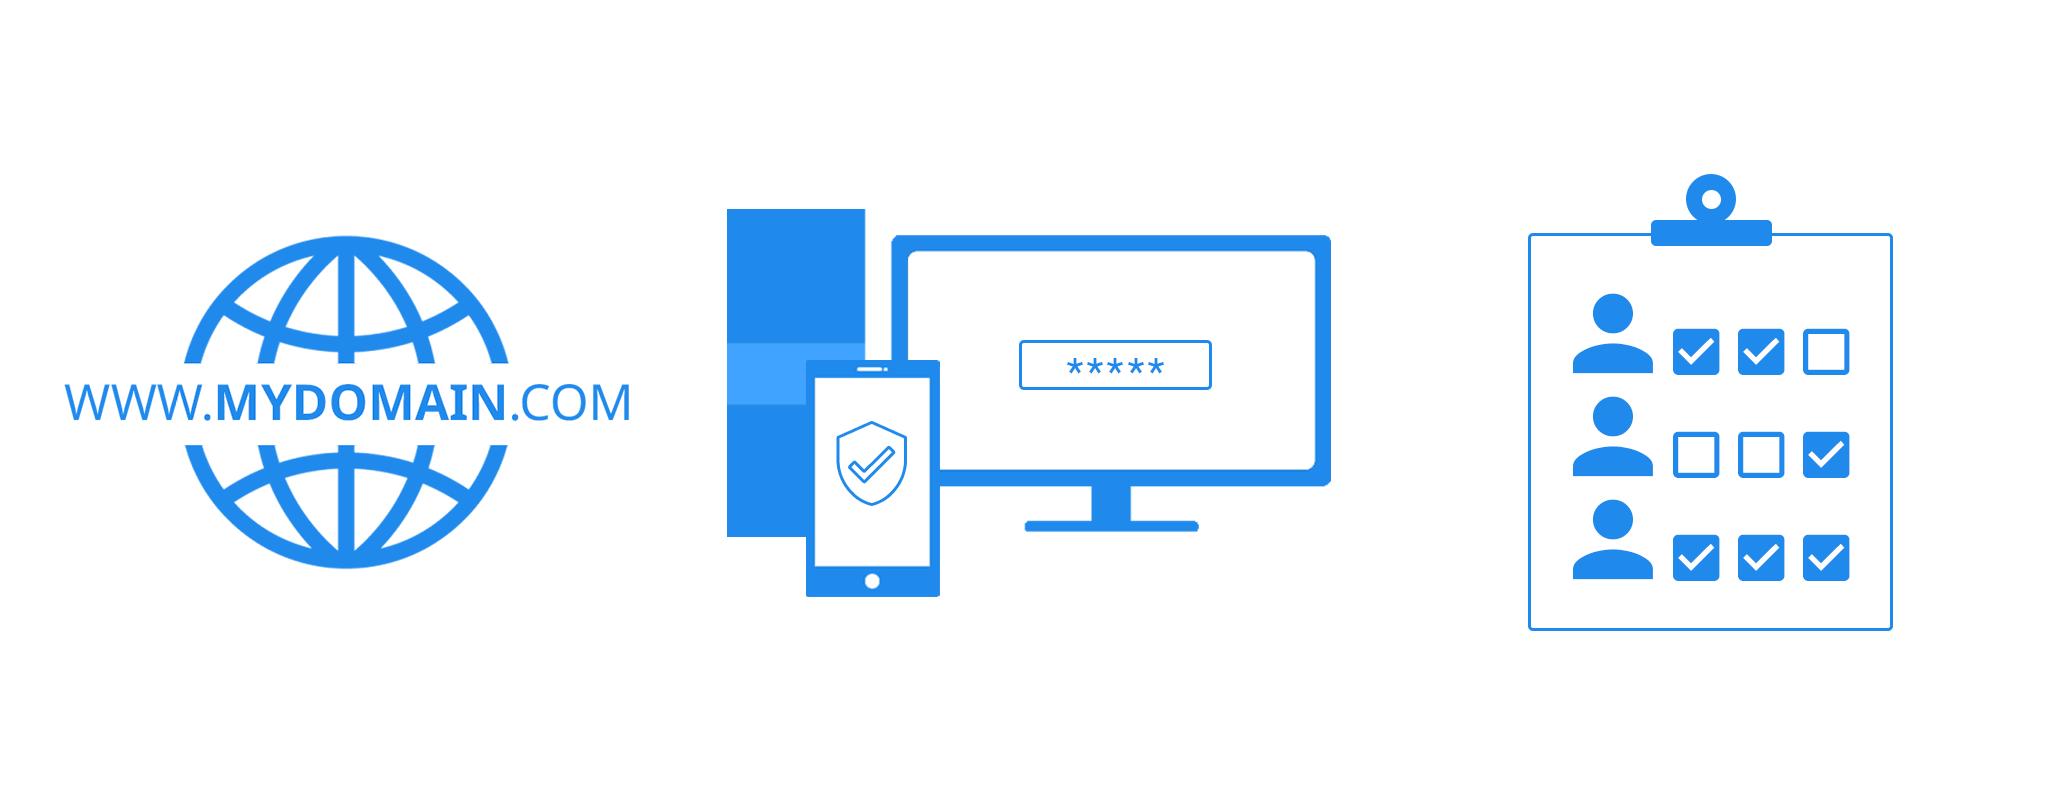 mfa-custom-domain-access-control-1